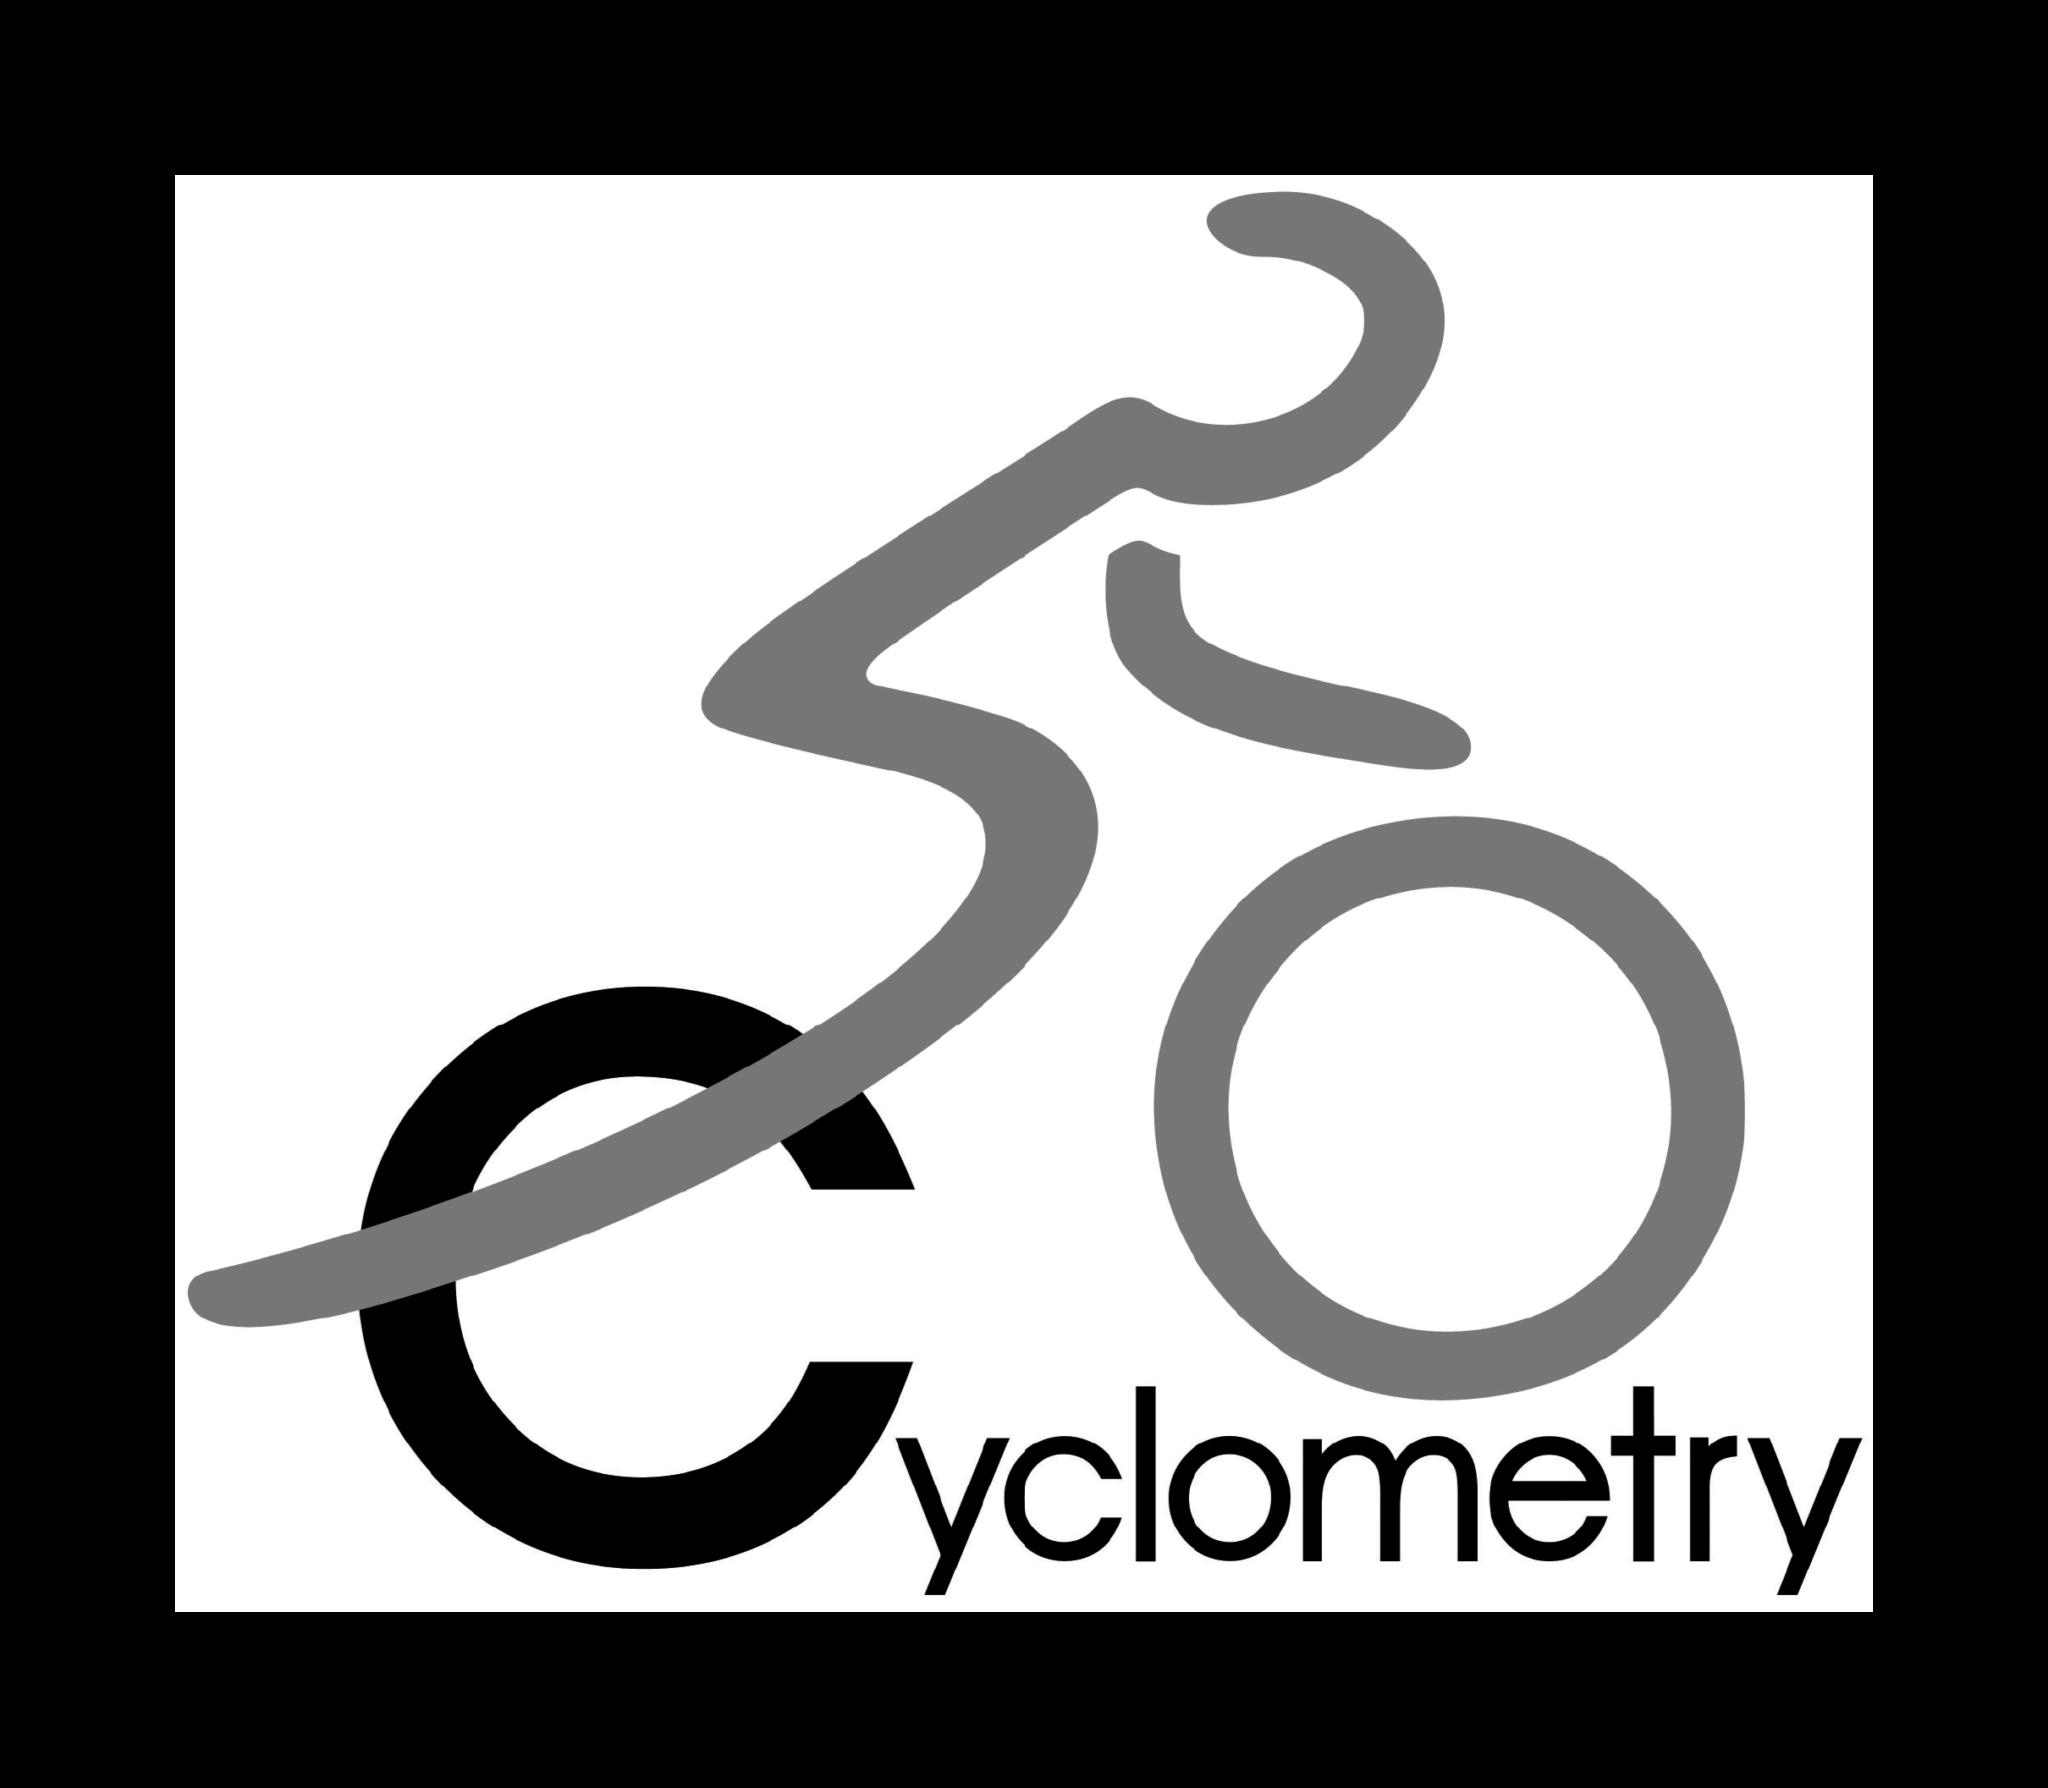 cyclometry